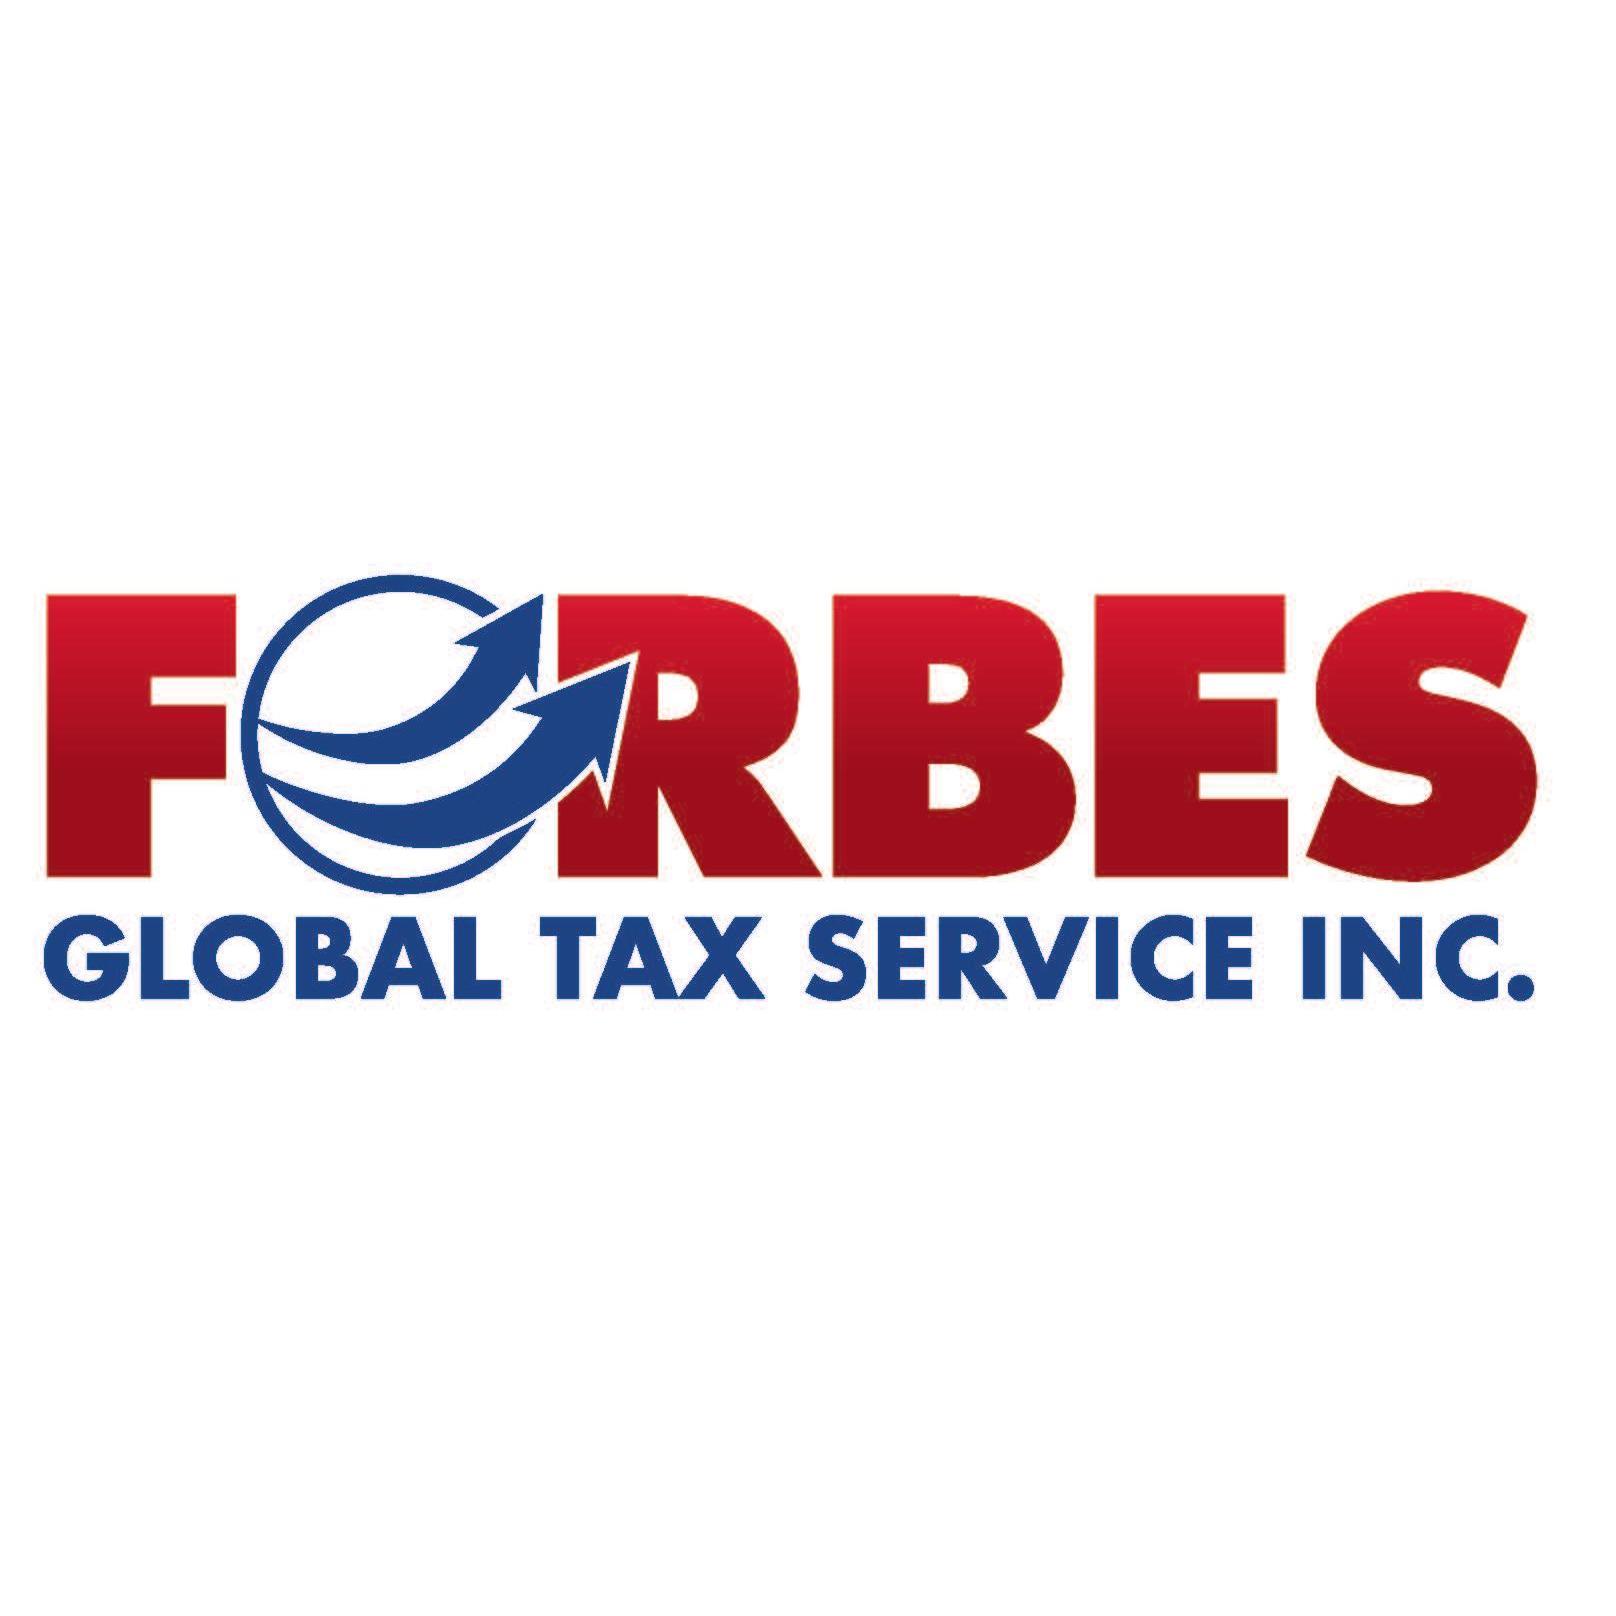 Forbes Global Tax Service Inc. - Auburndale, FL - Notaries